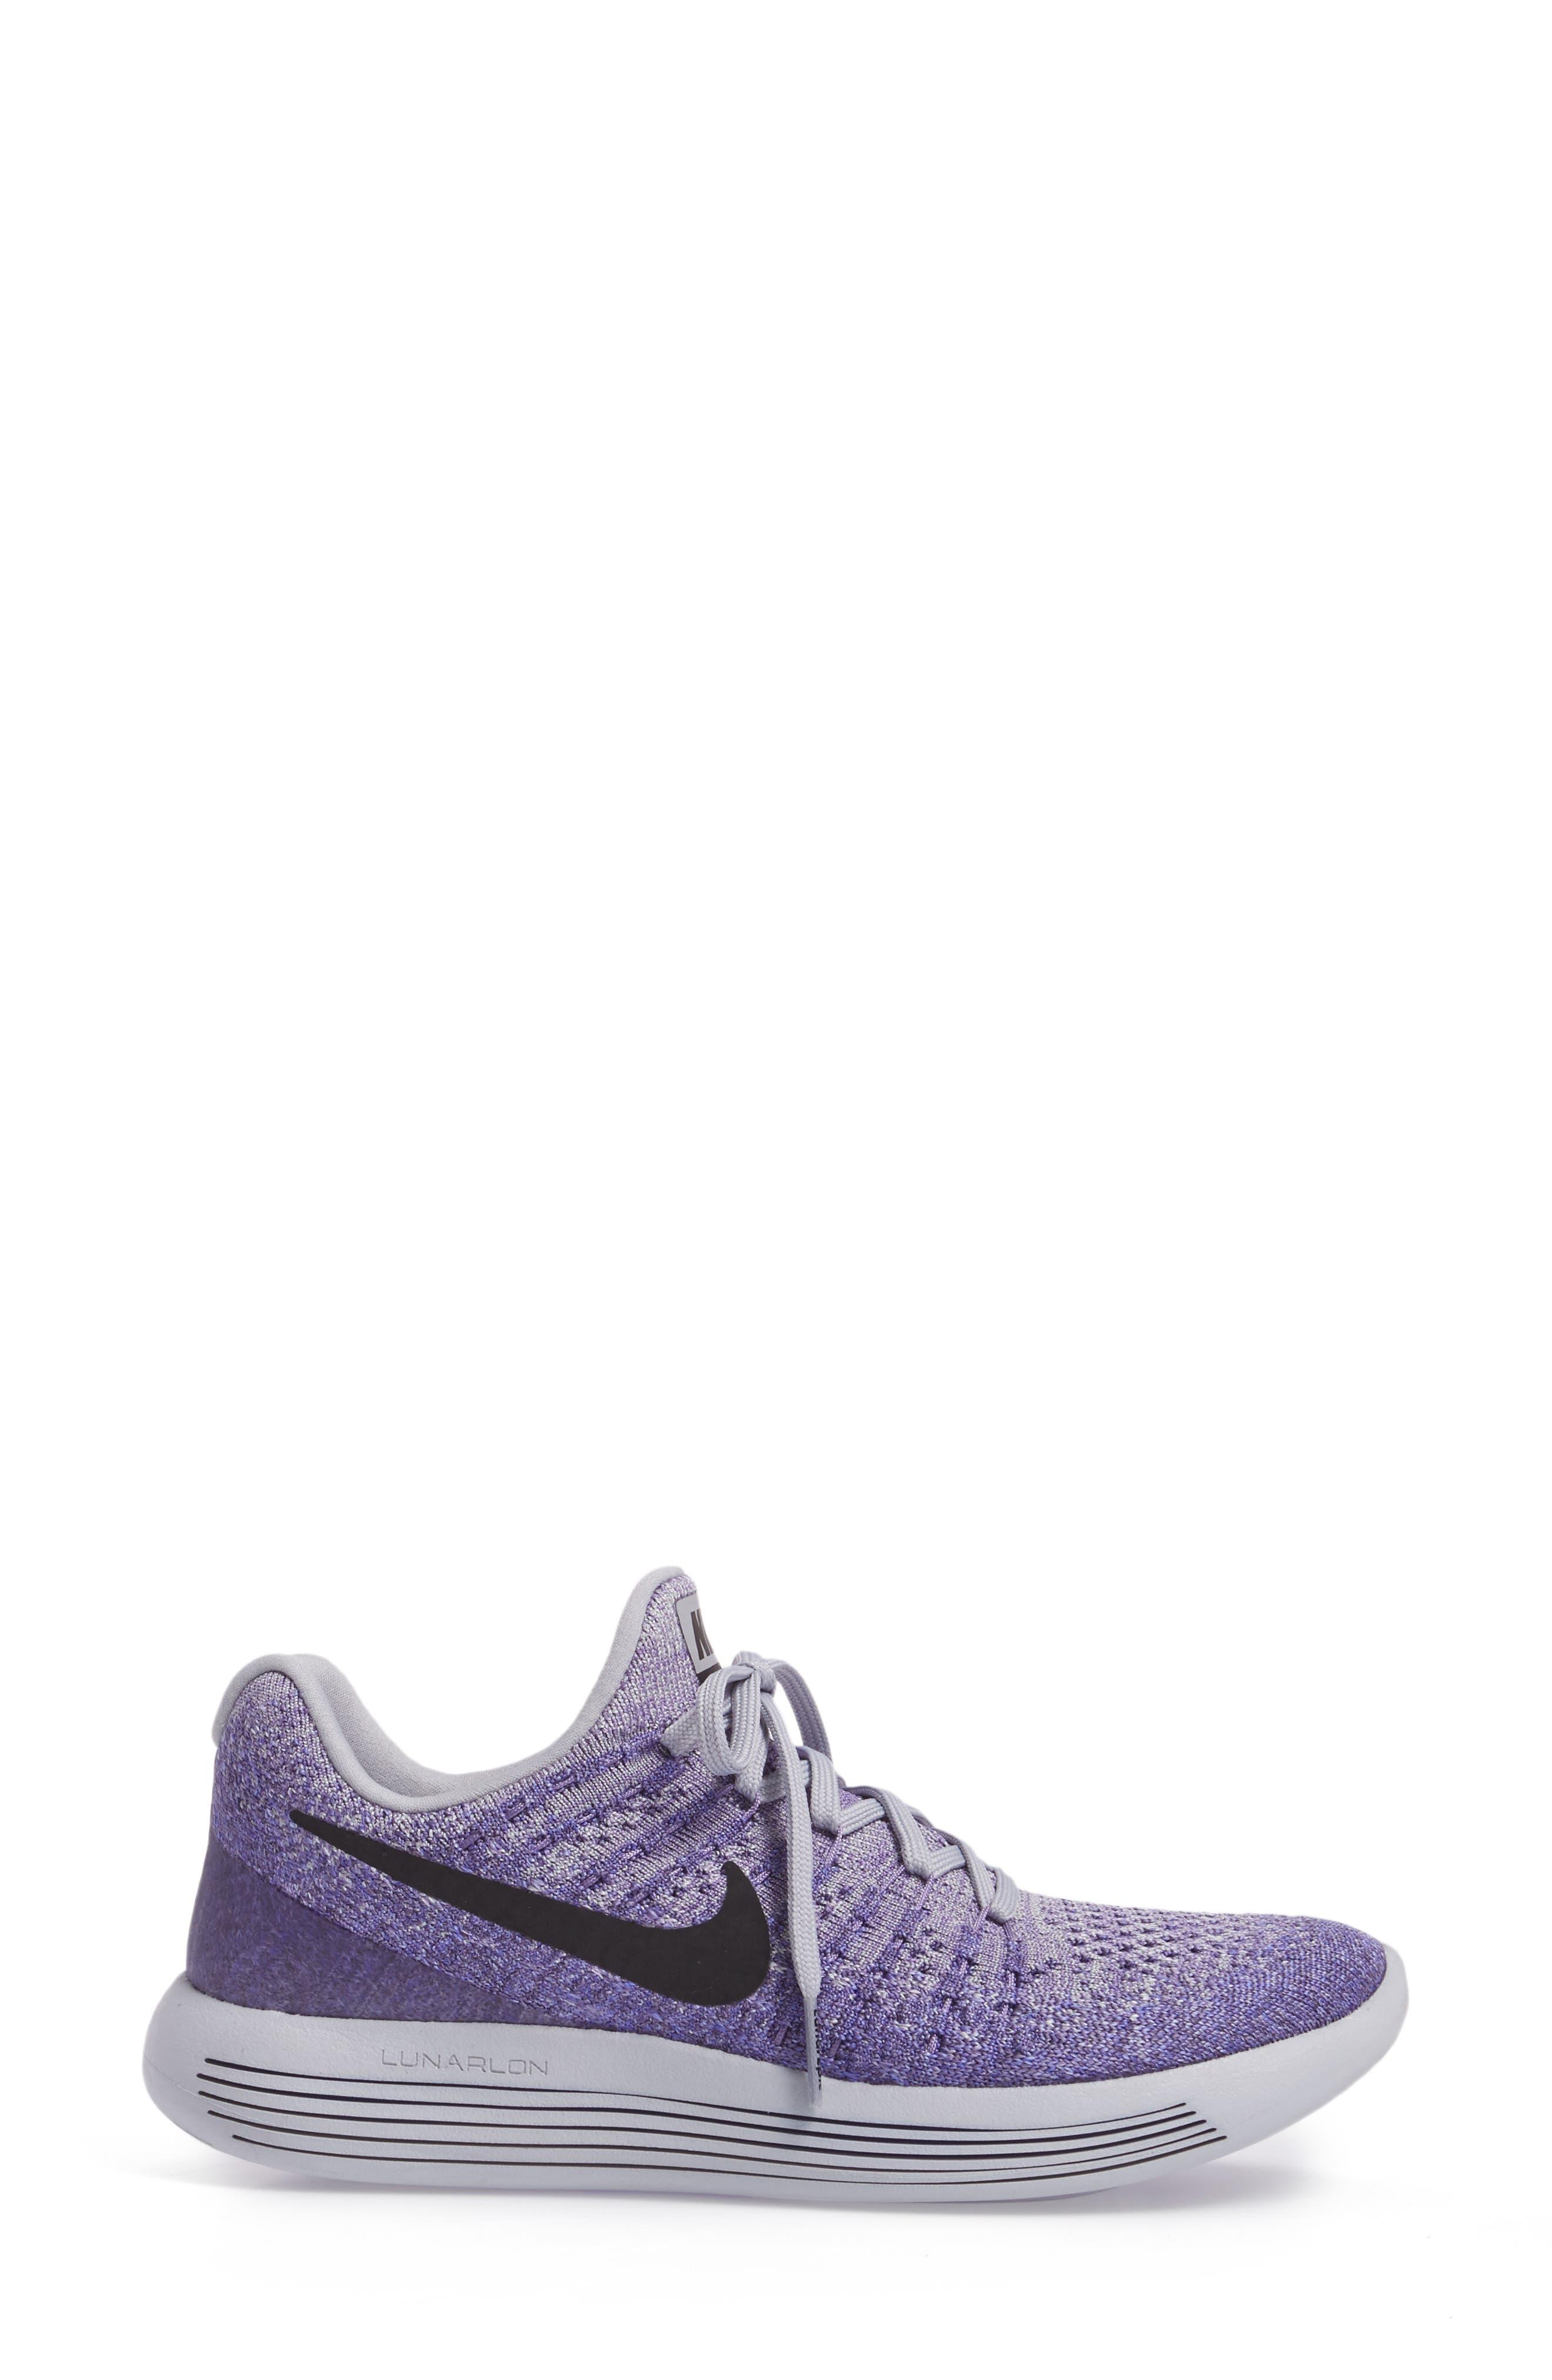 LunarEpic Low Flyknit 2 Running Shoe,                             Alternate thumbnail 58, color,